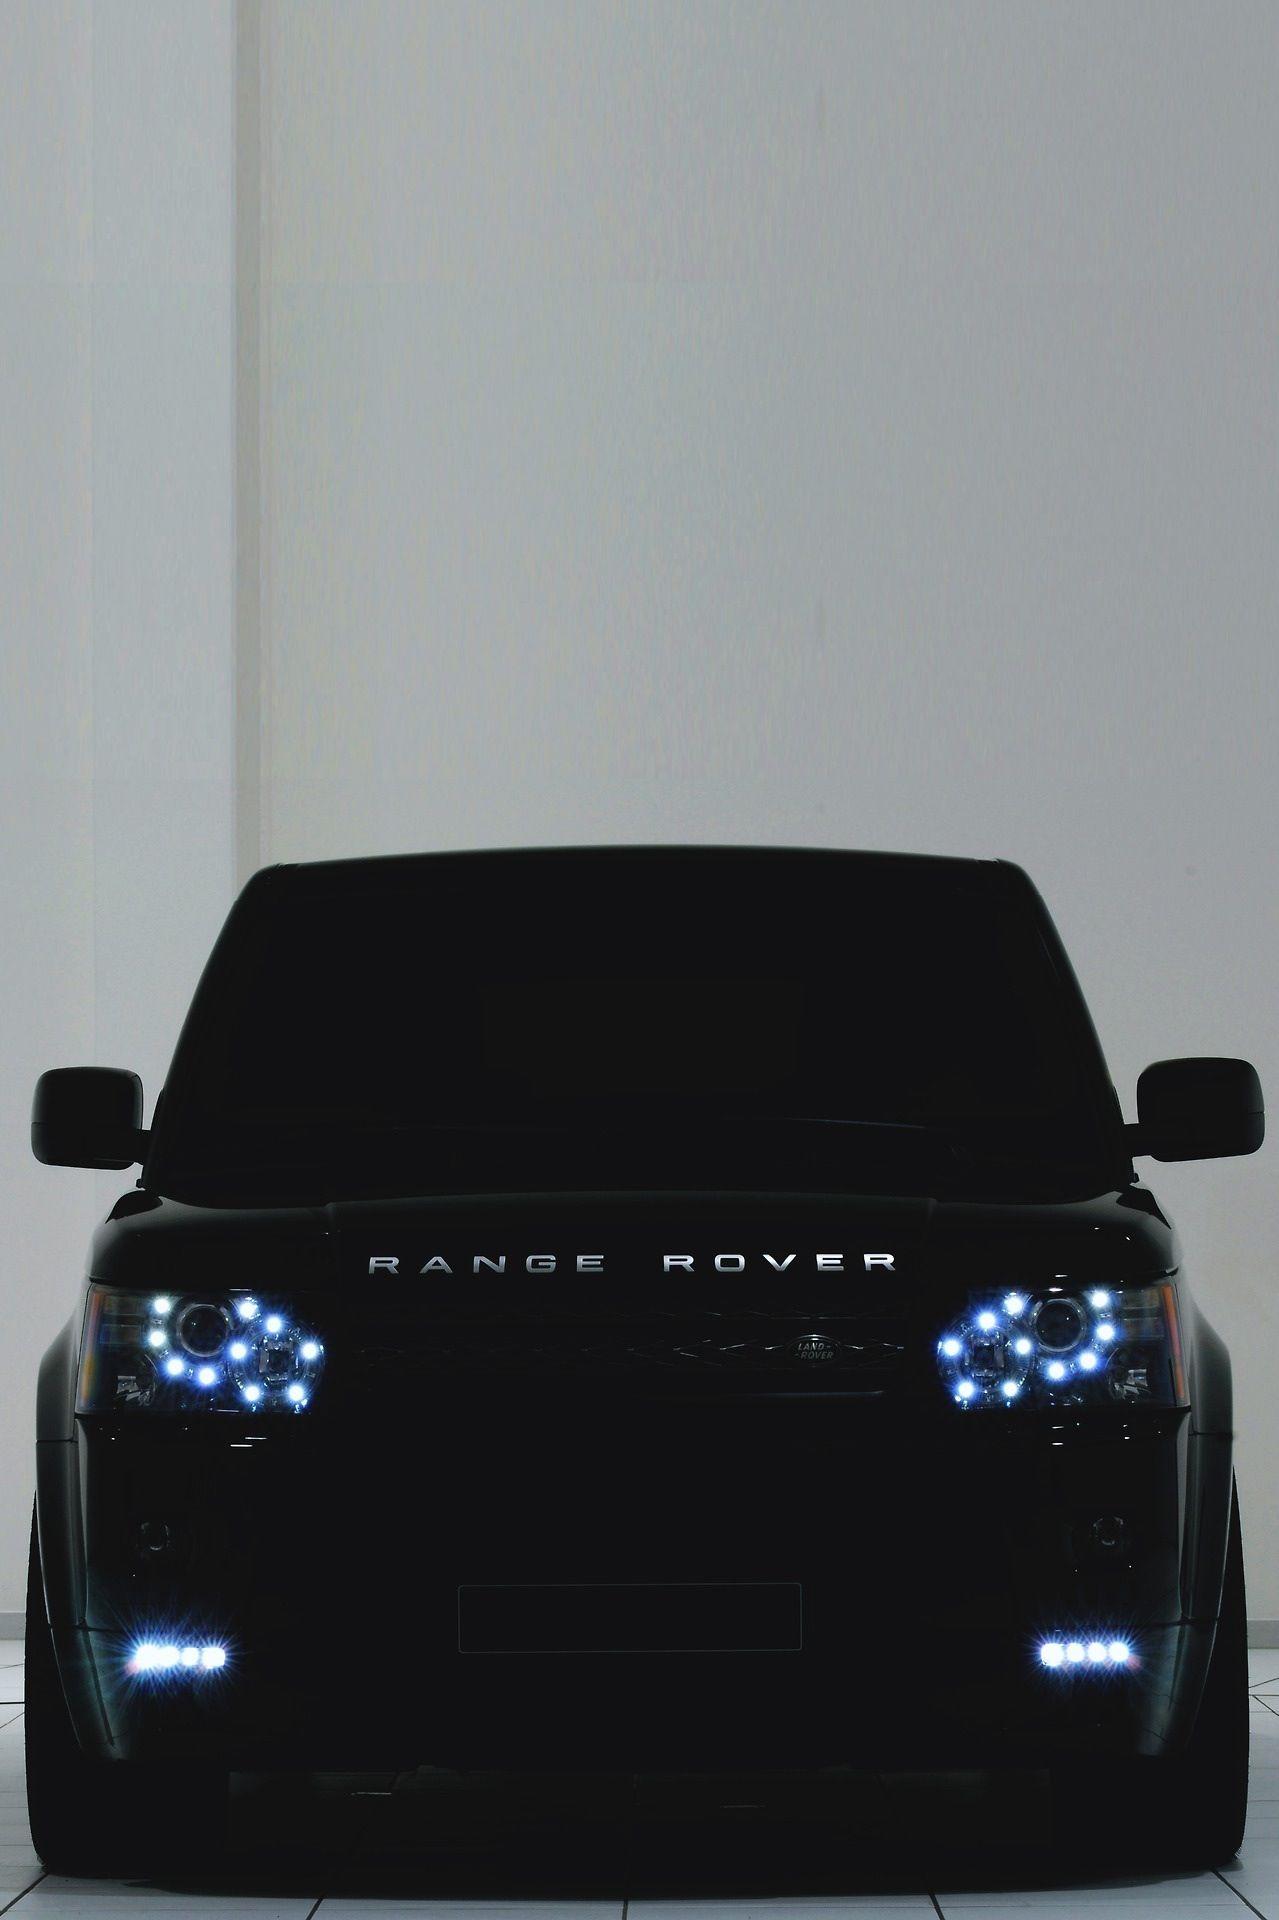 Mr Range Rover